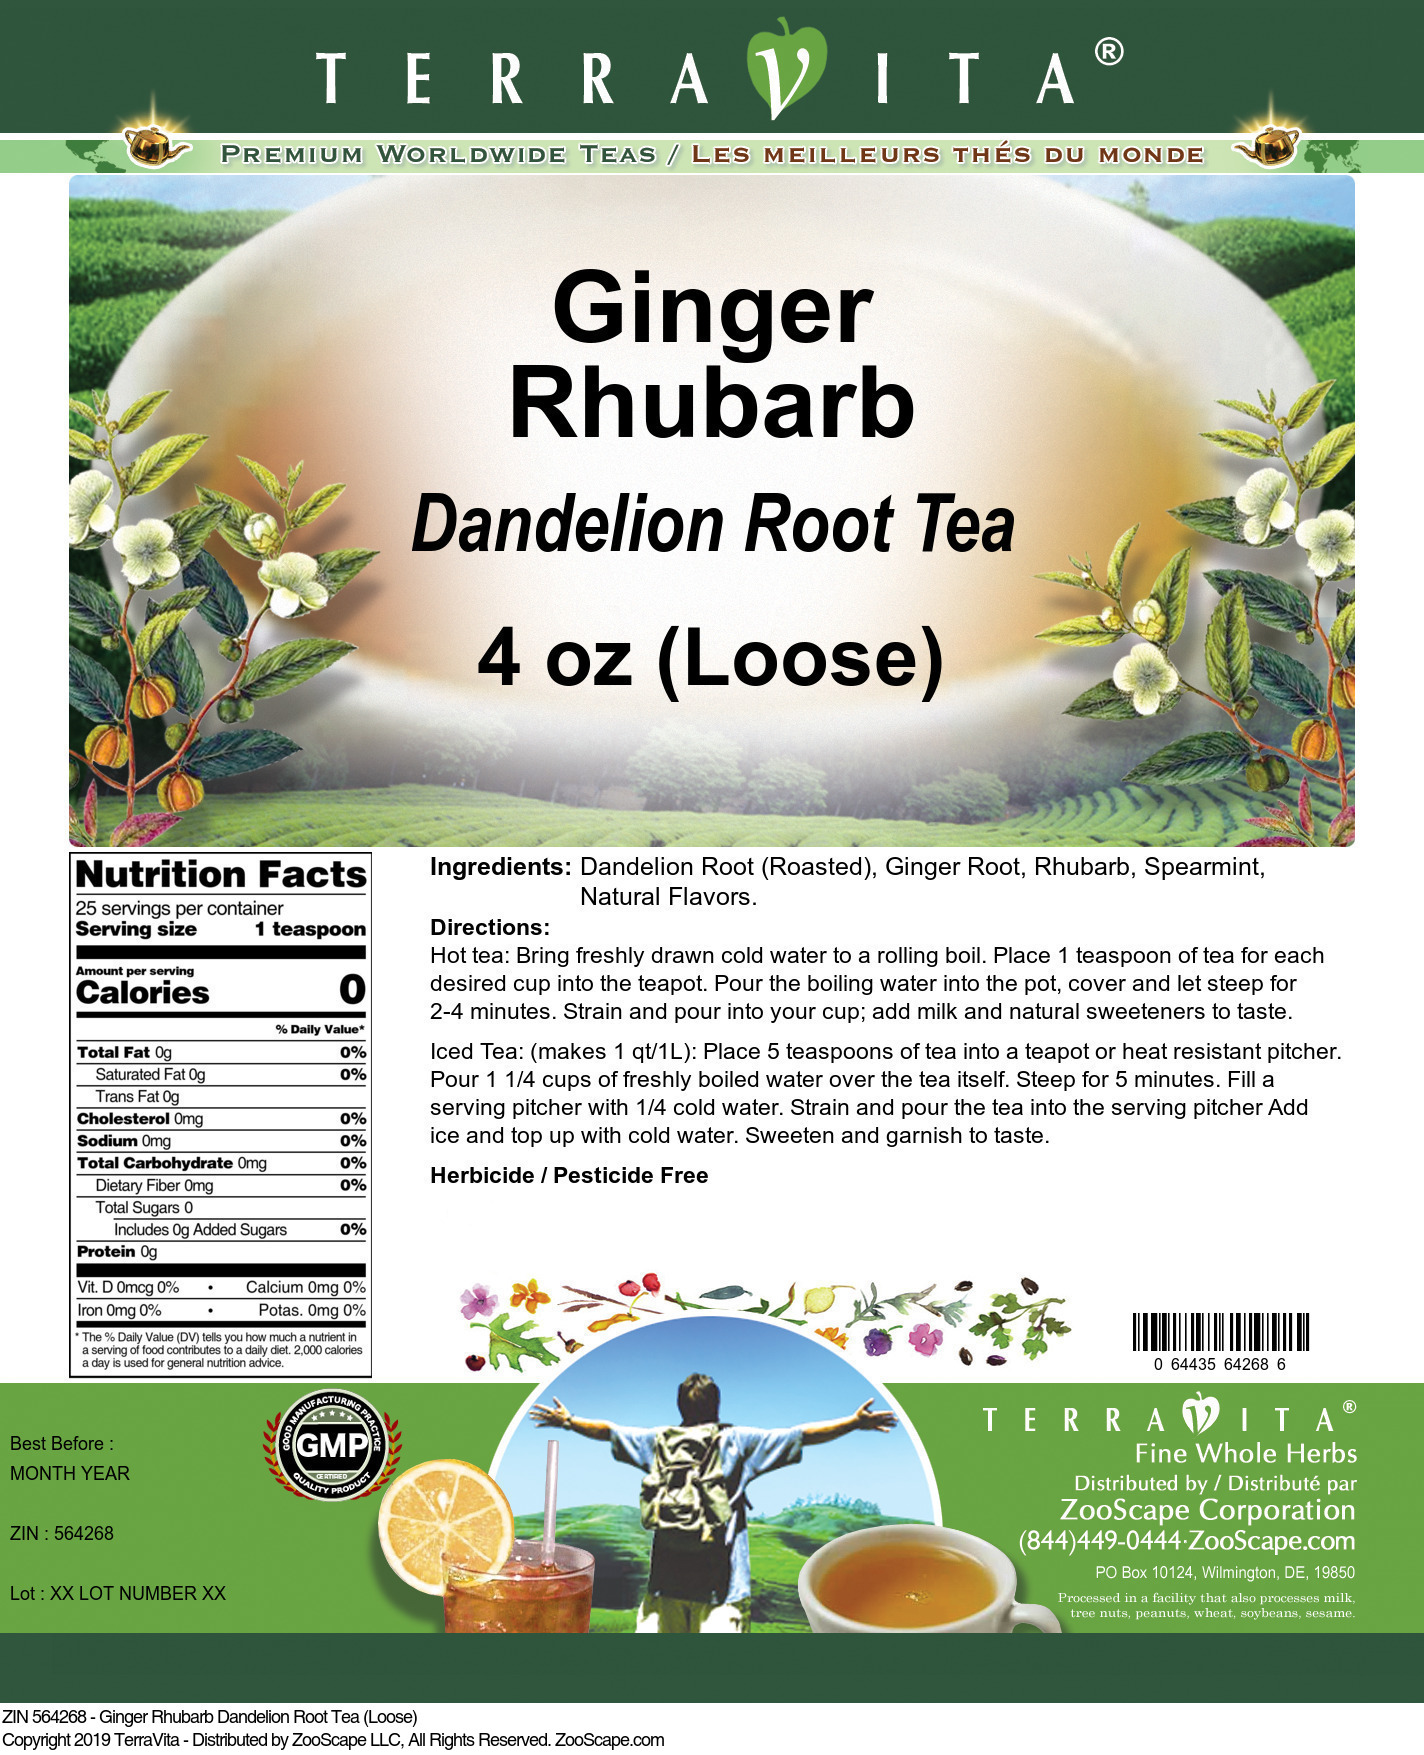 Ginger Rhubarb Dandelion Root